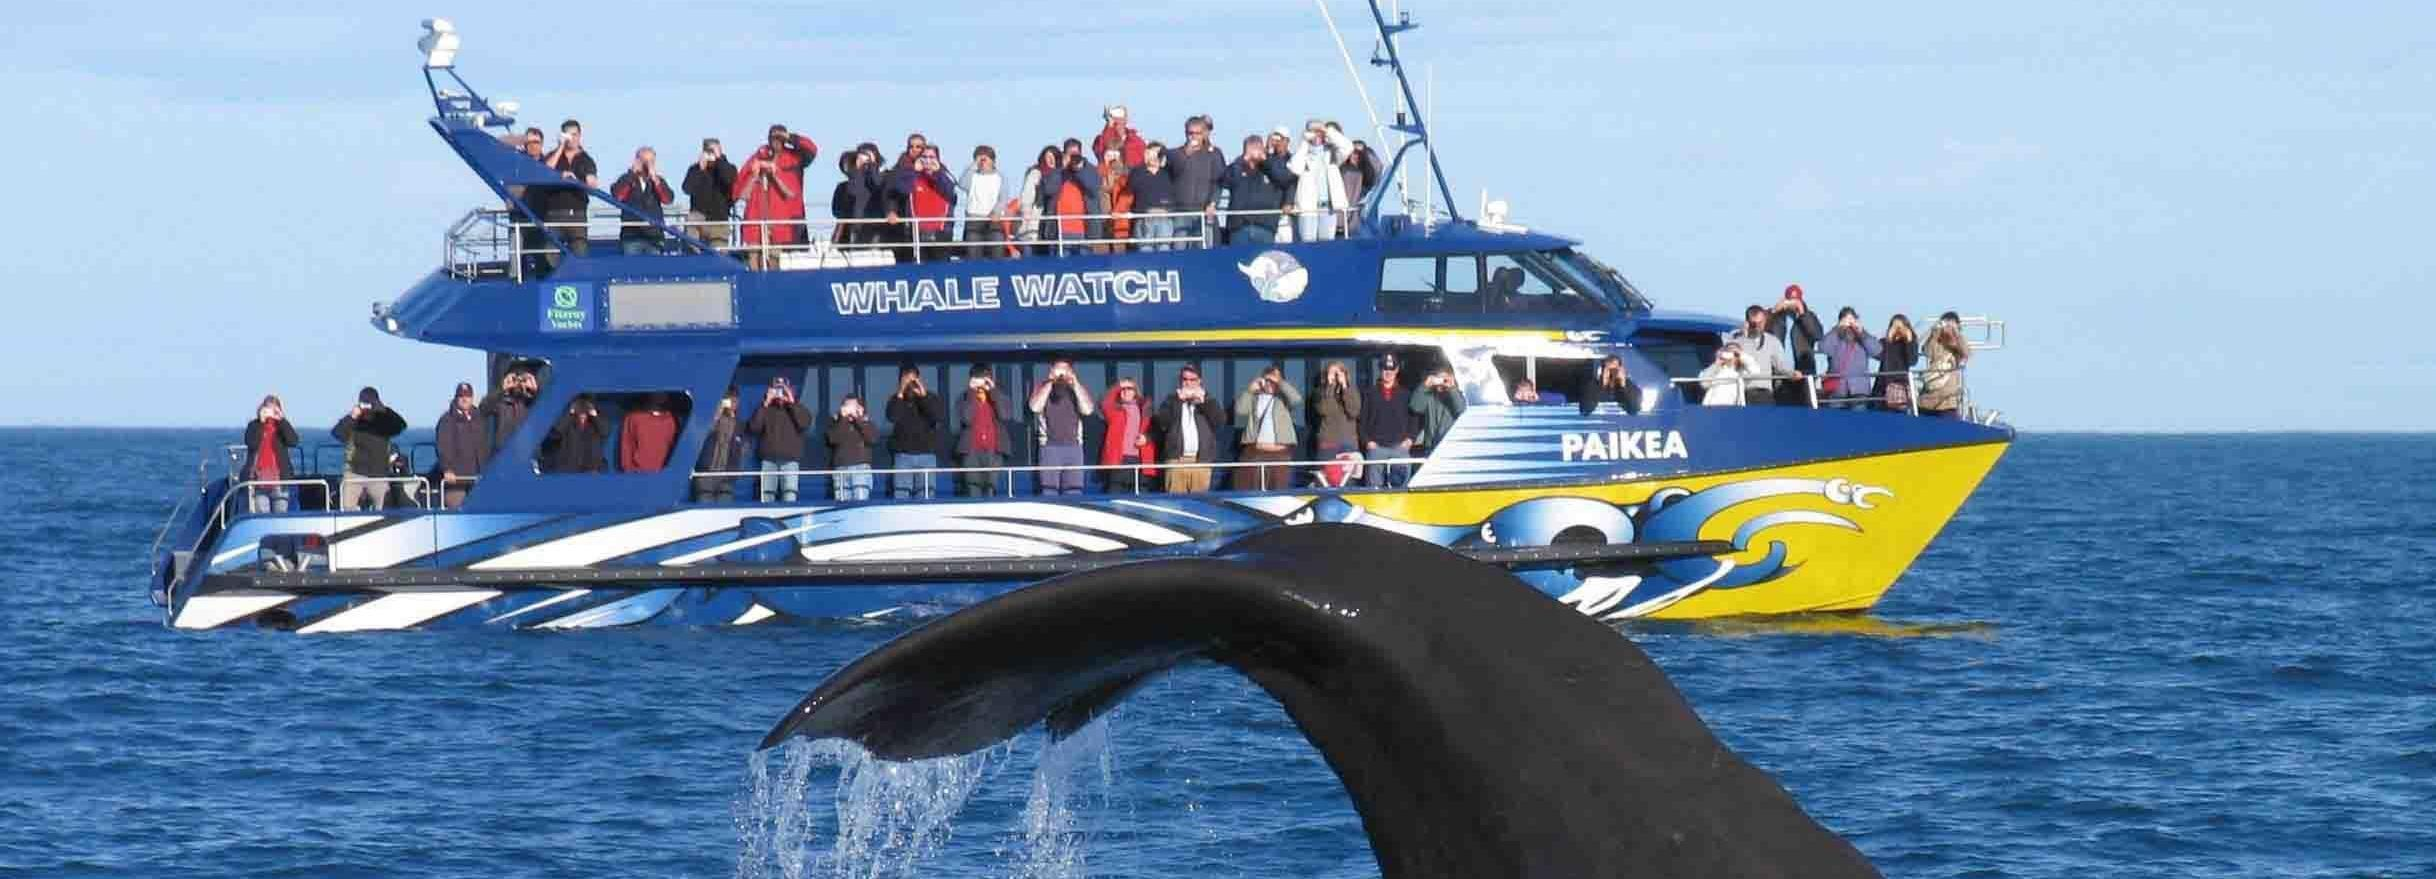 Kaikoura Whale Watching Premium Day Tour vanuit Christchurch